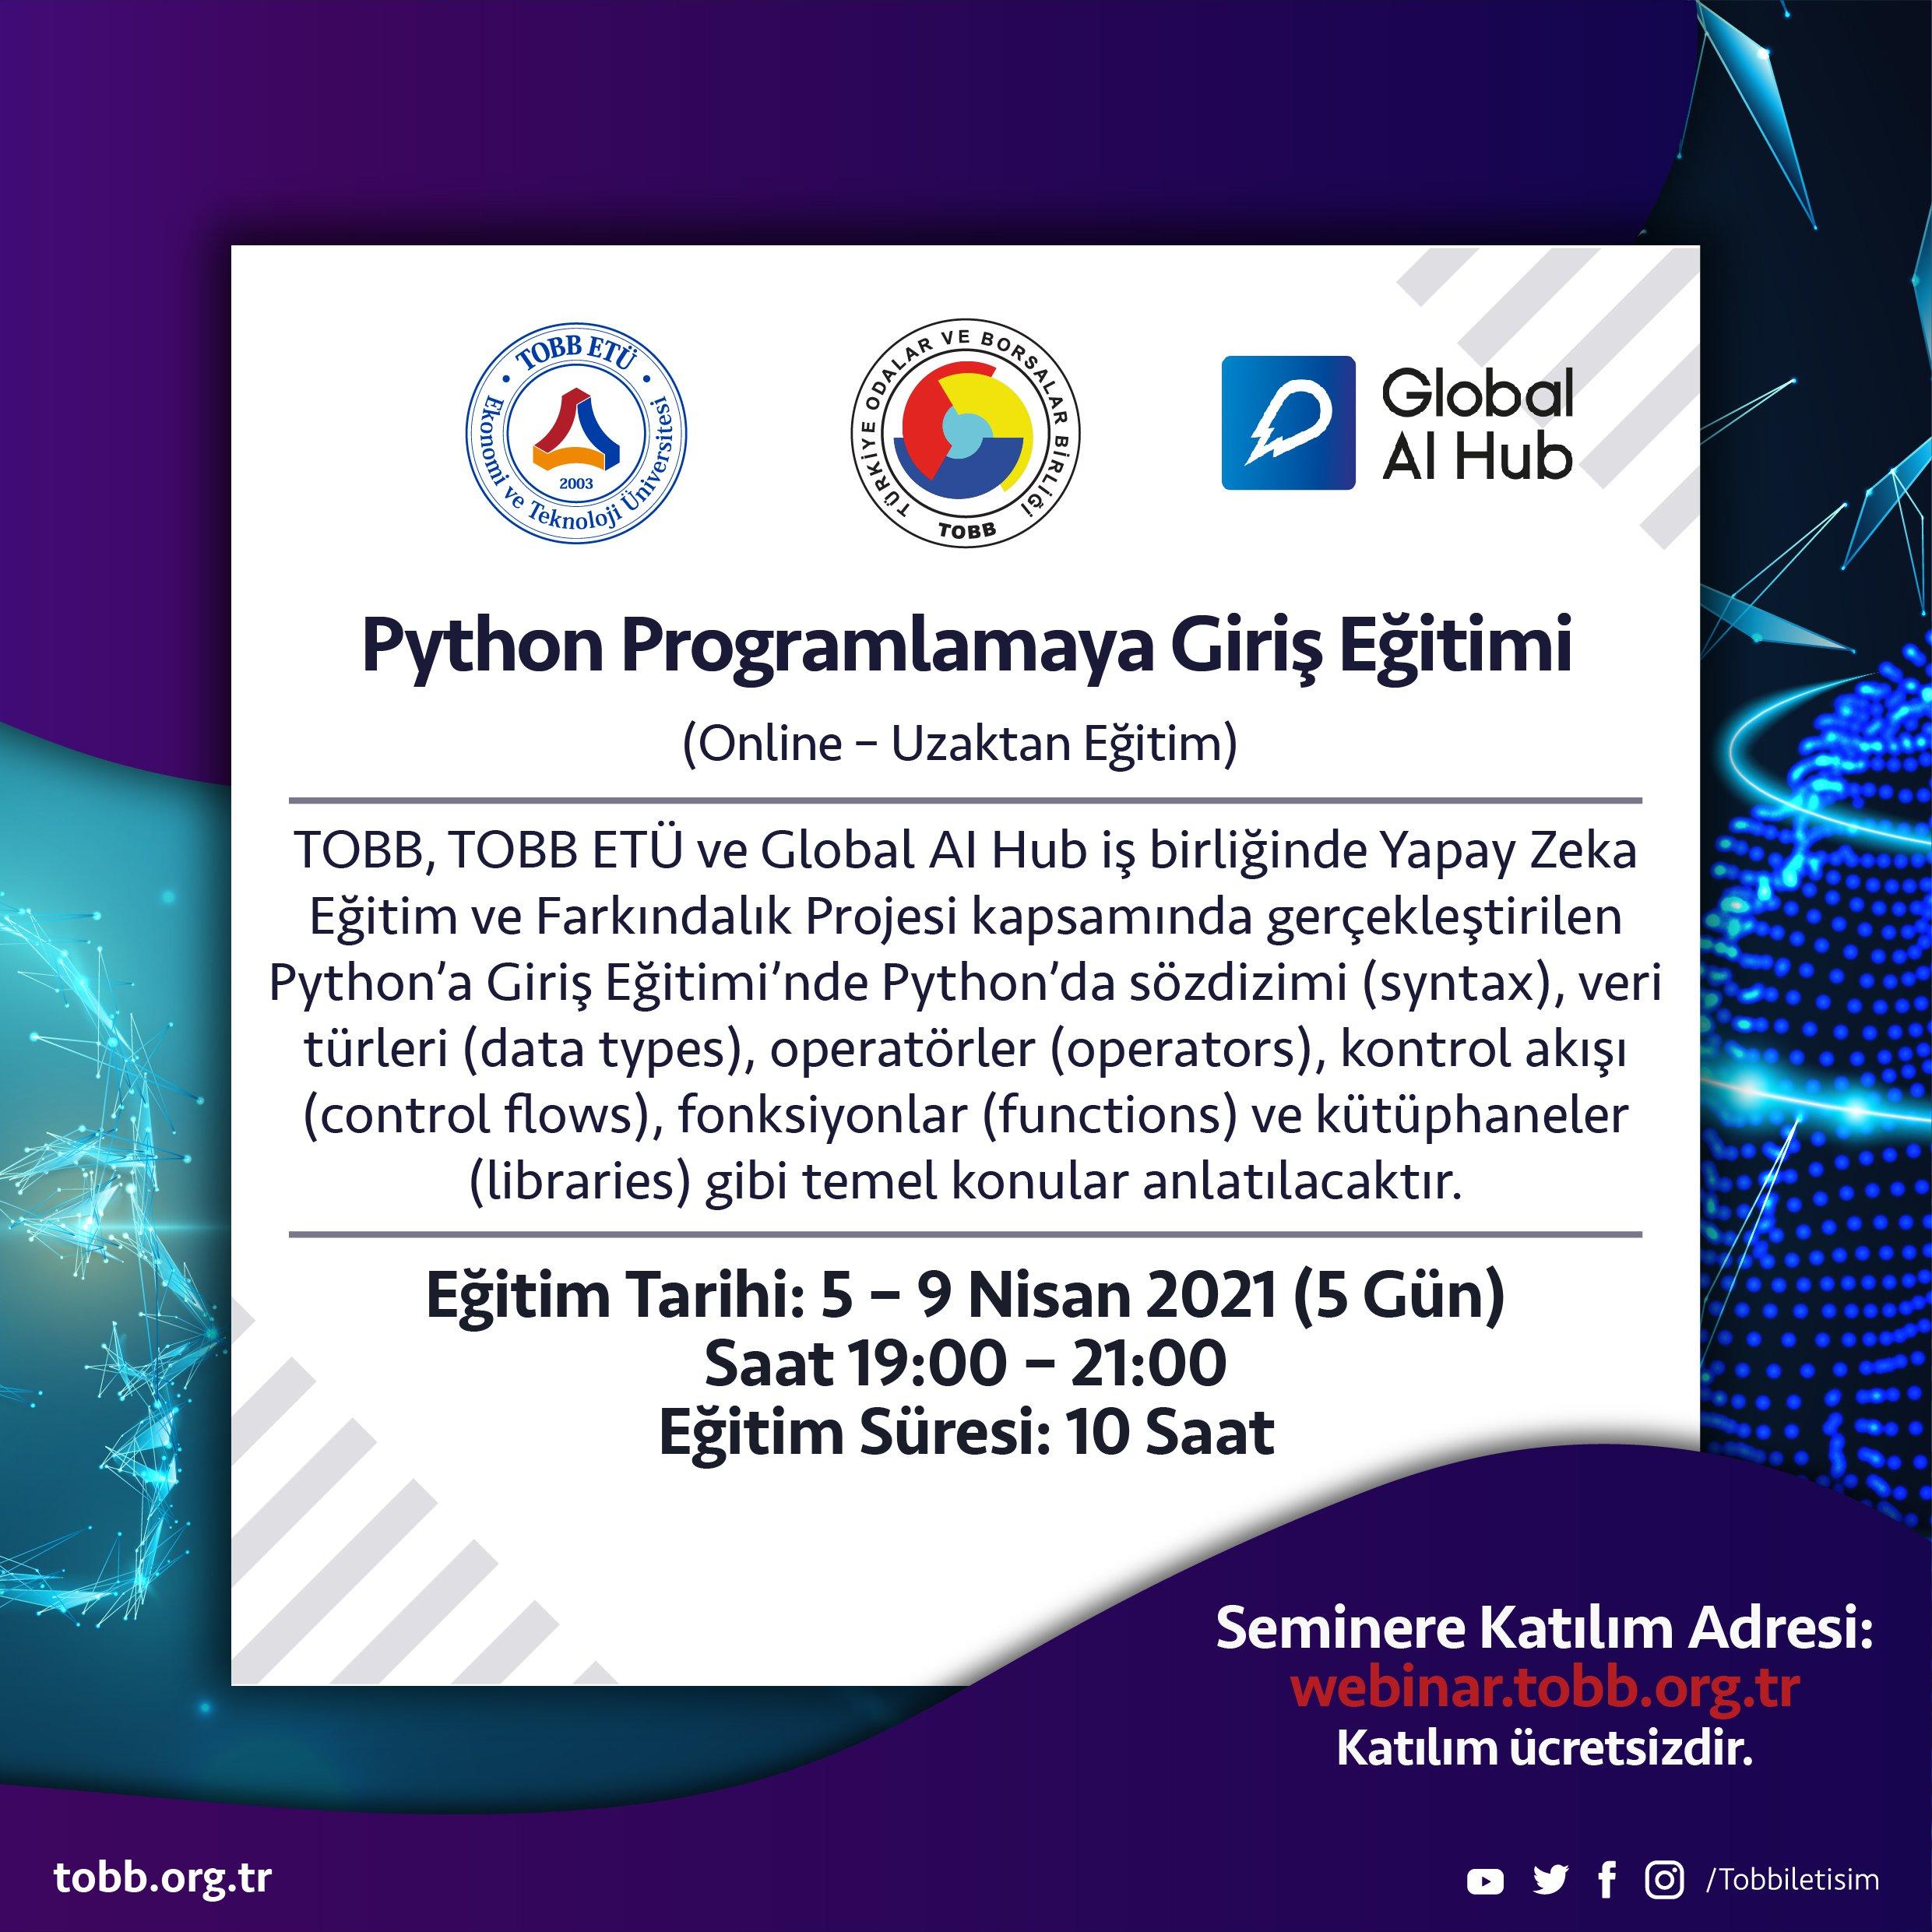 Python'a Giriş Eğitimi